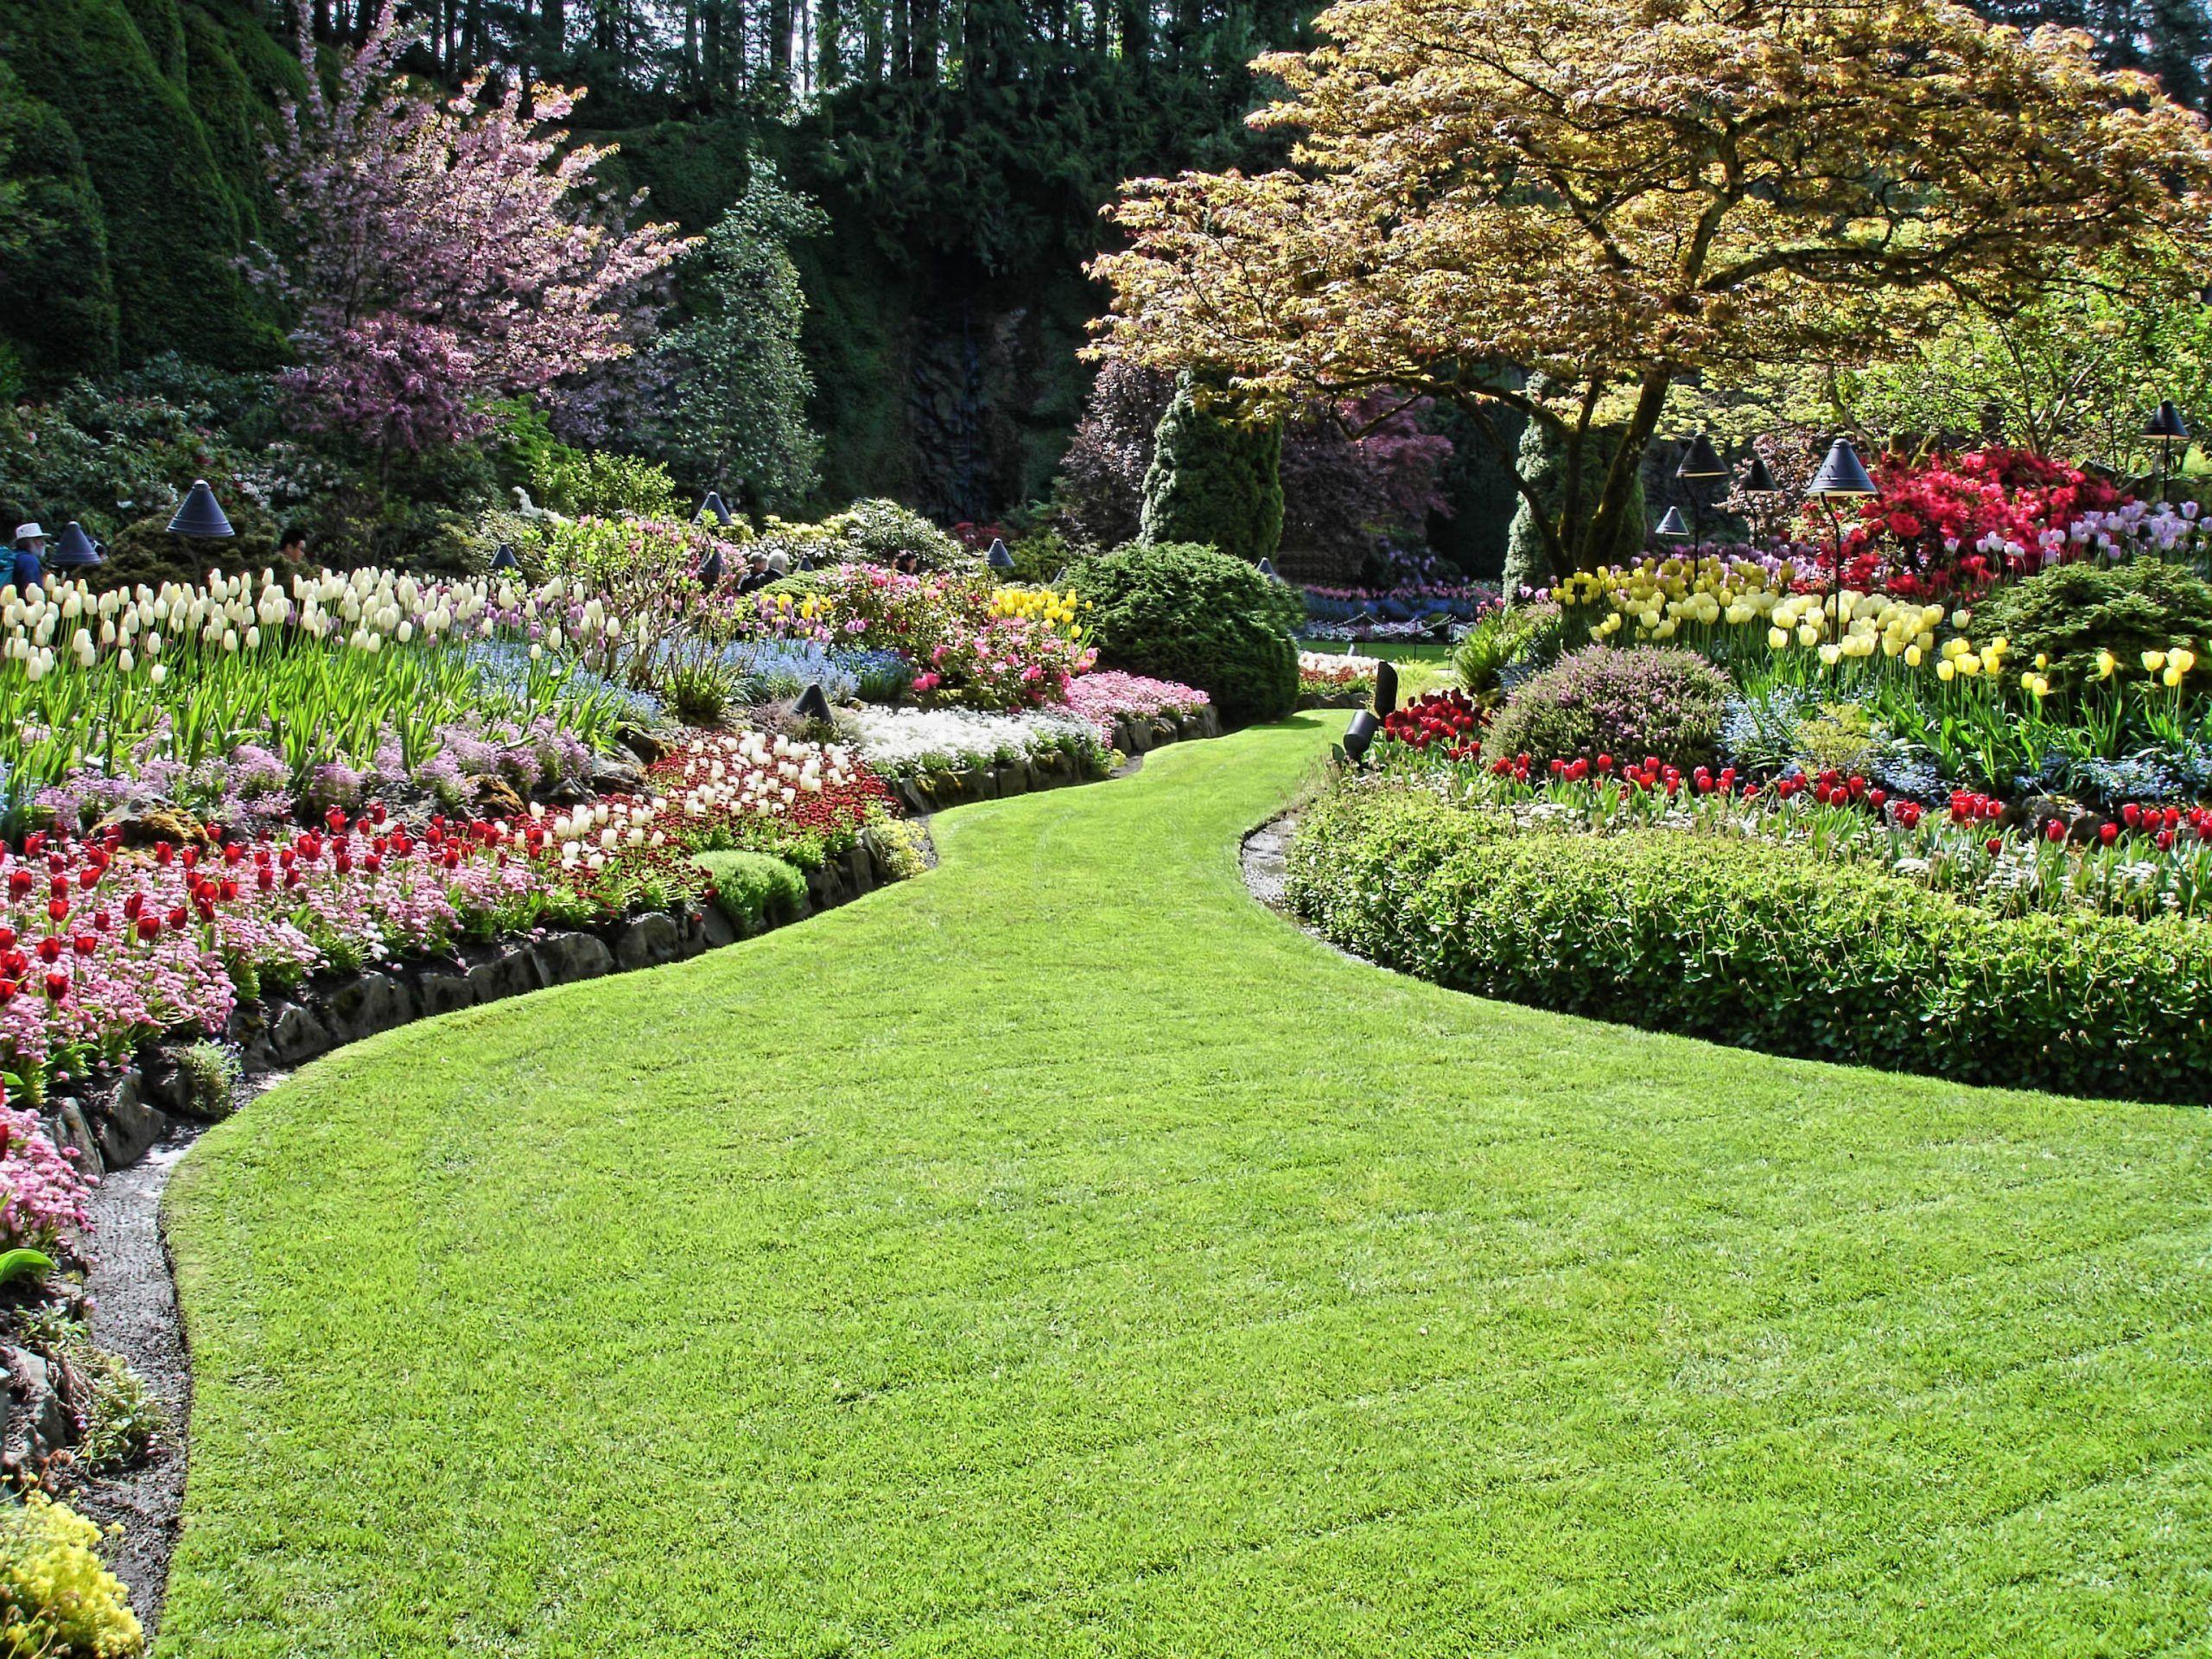 Landscaping-idea-1